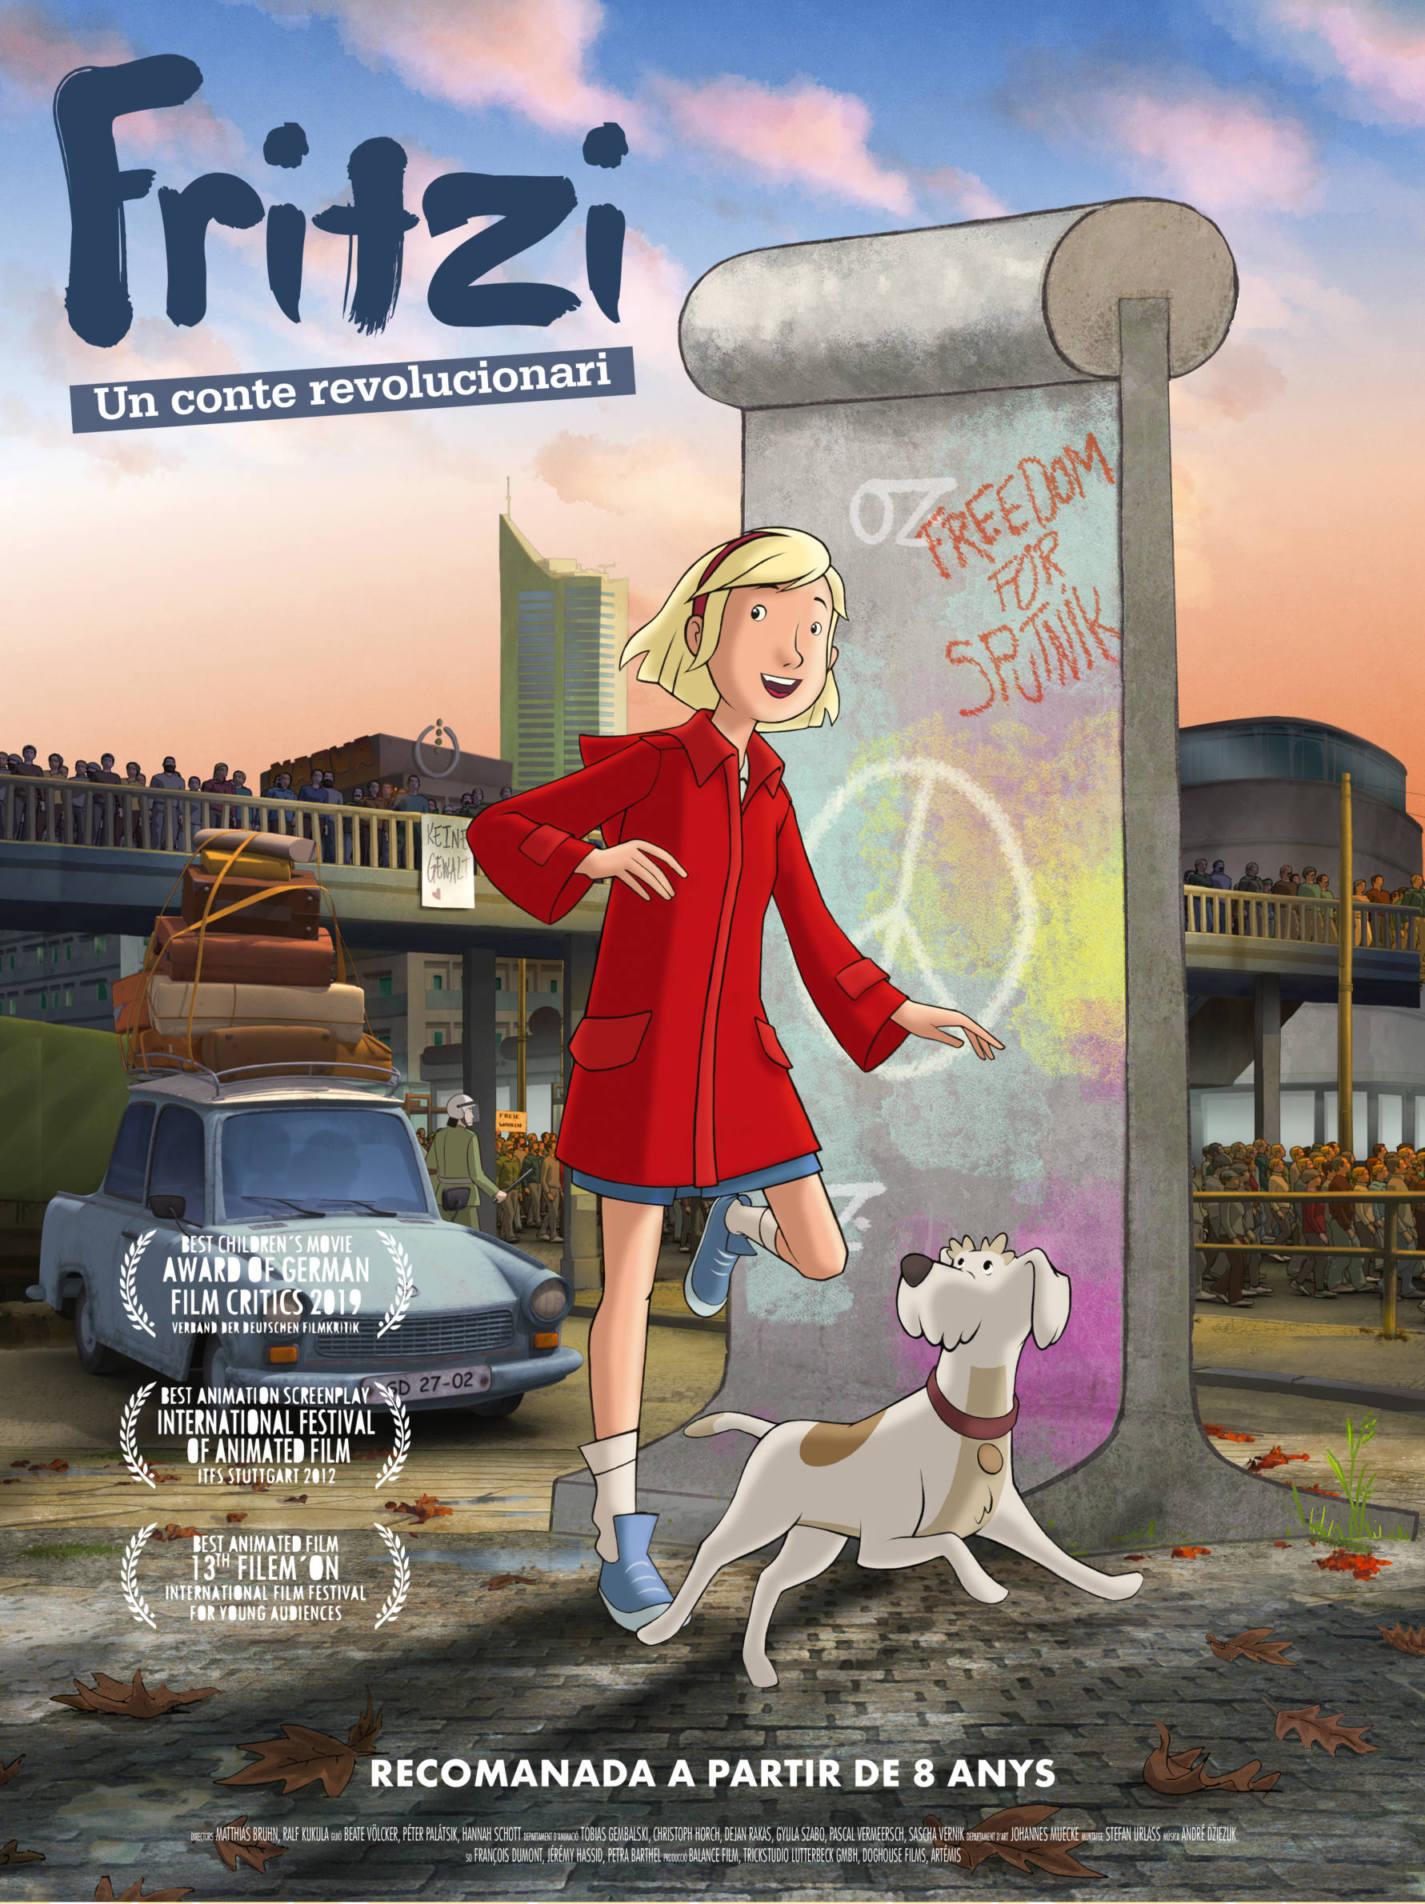 Fritzi, un conte revolucionari